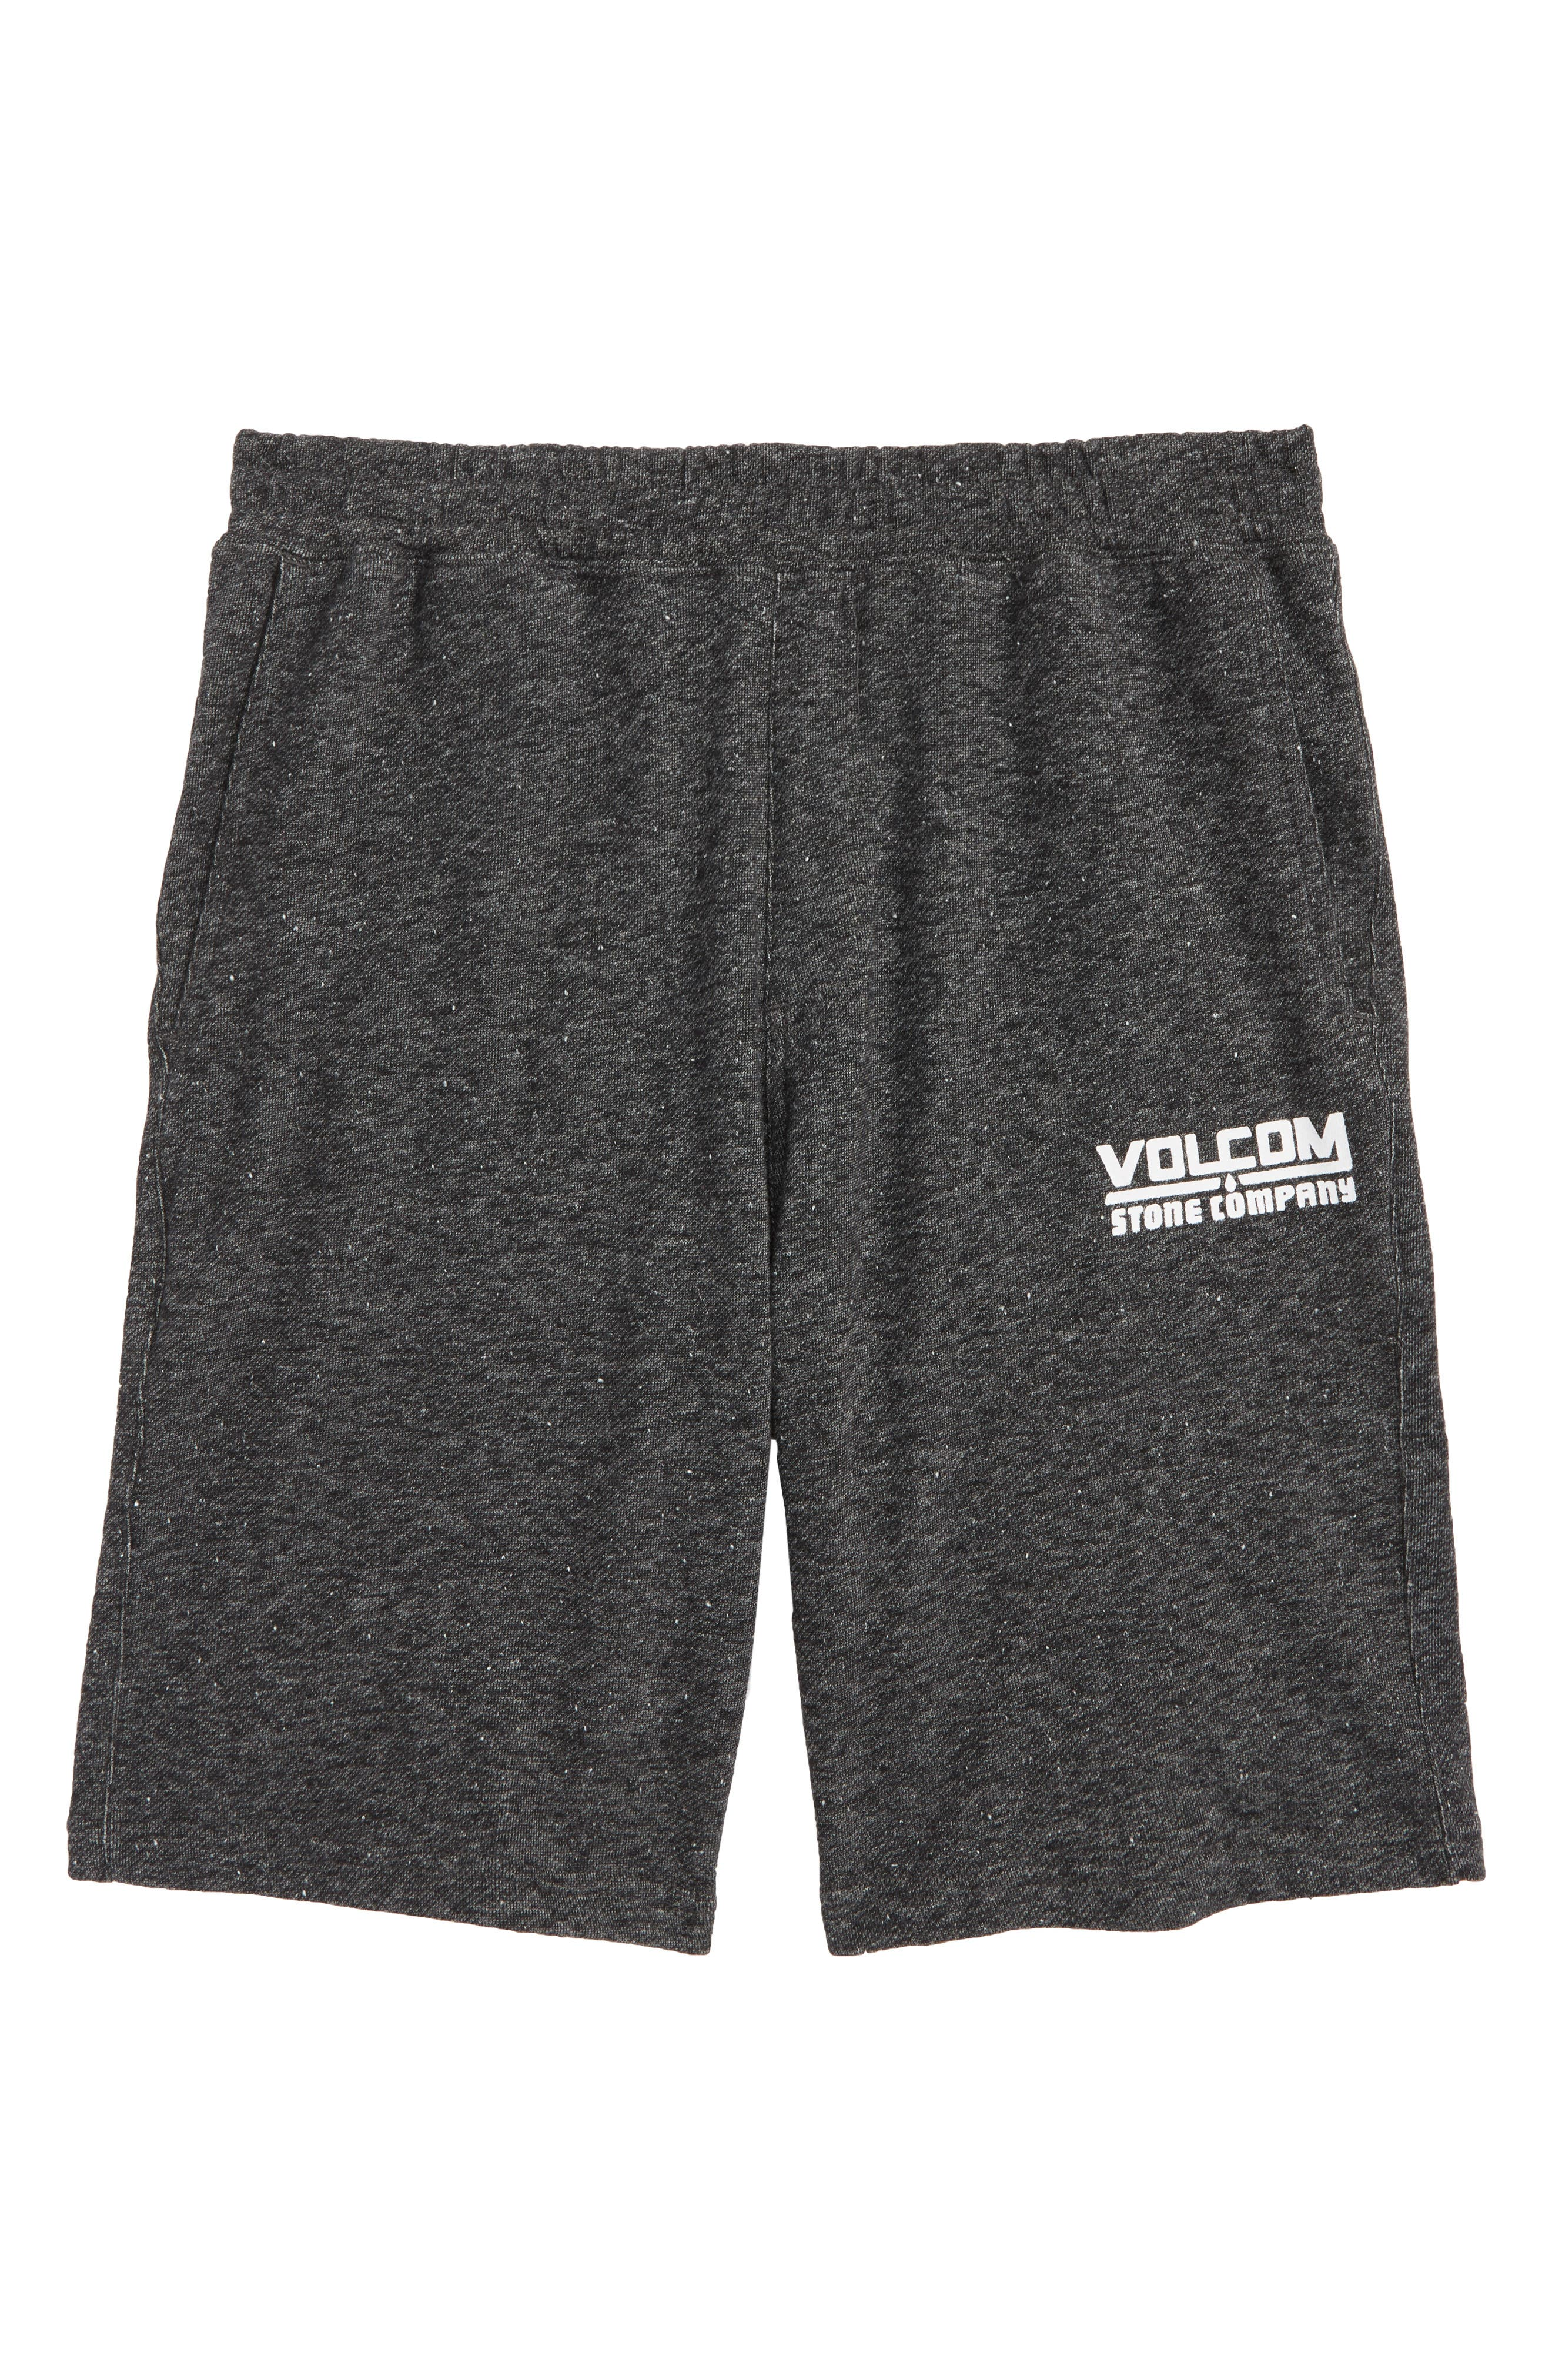 VOLCOM Billing Shorts, Main, color, 001